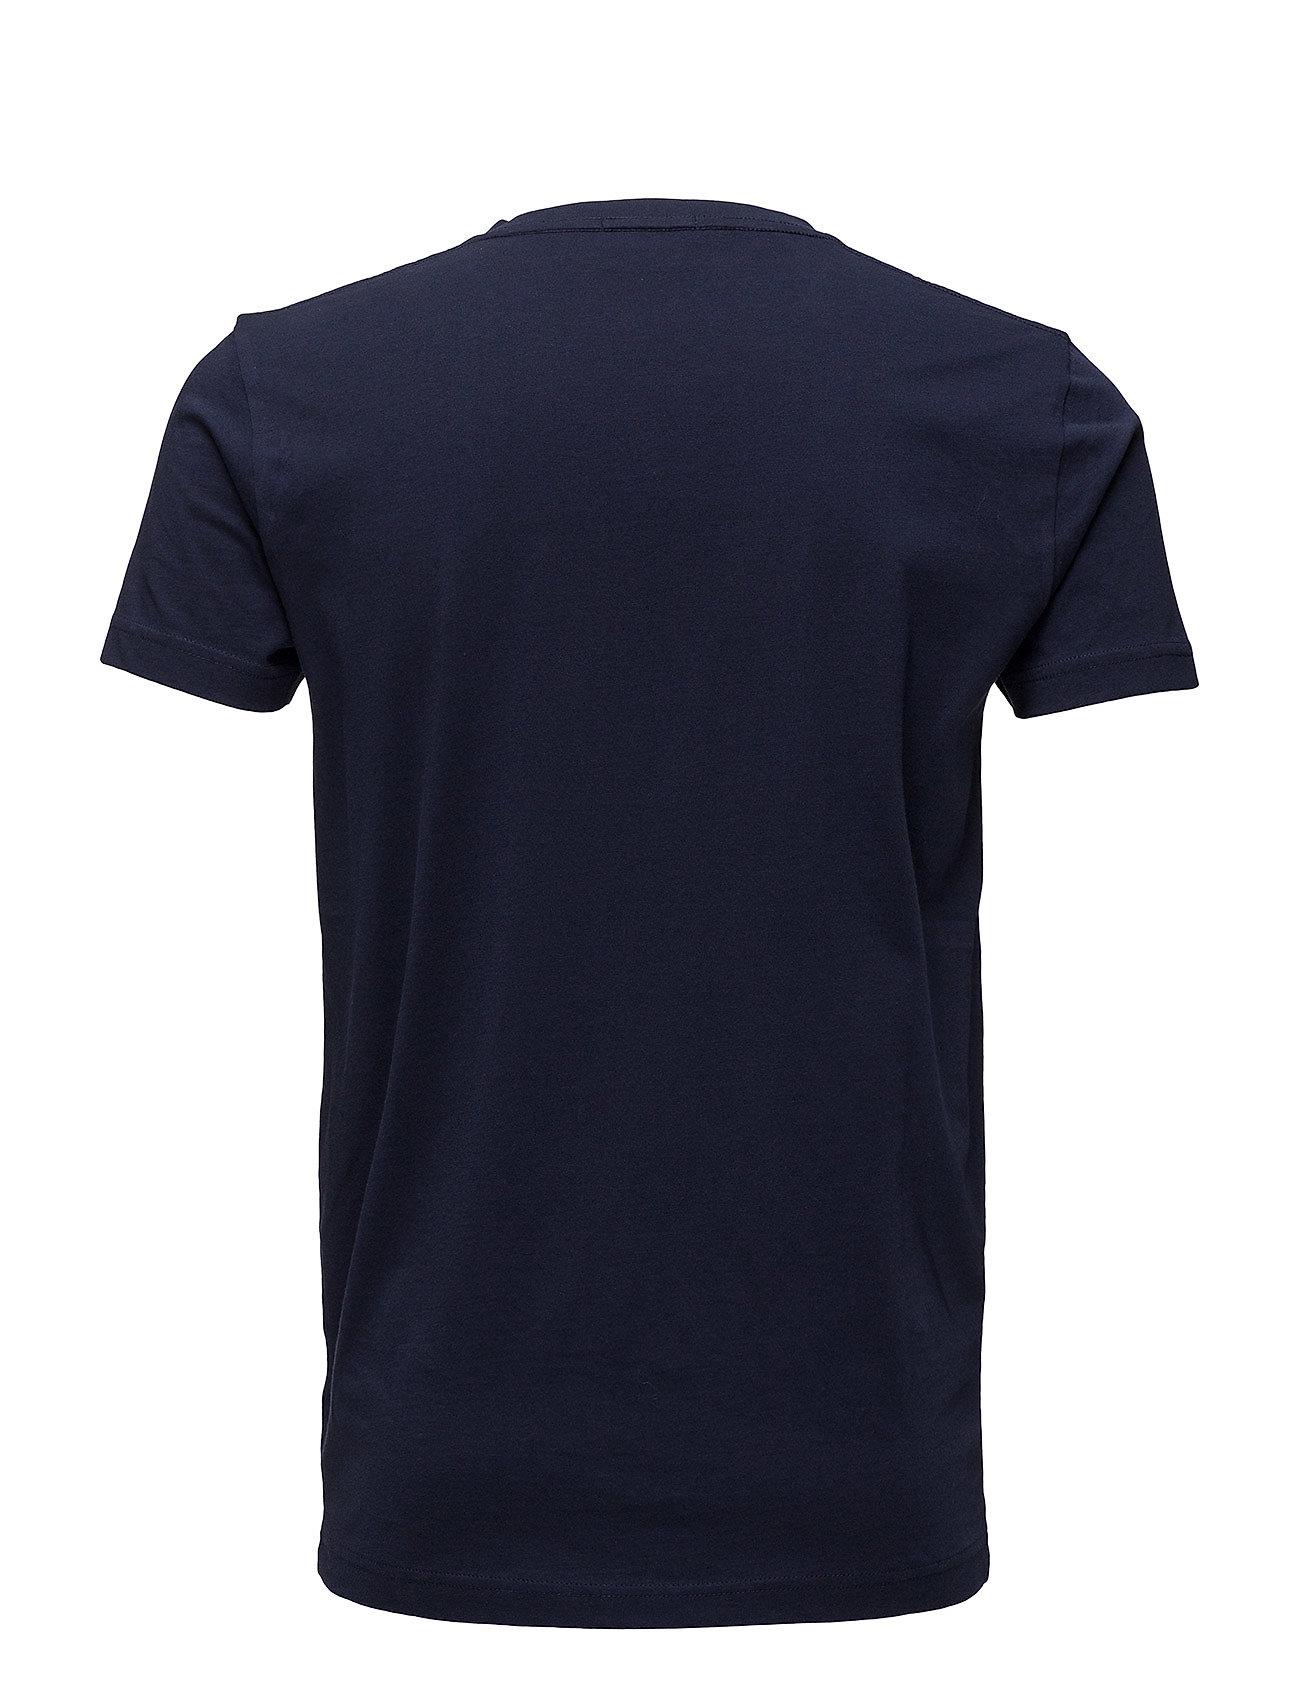 The T Original BlueGant shirtevening neck V Slim YvIyfb76g